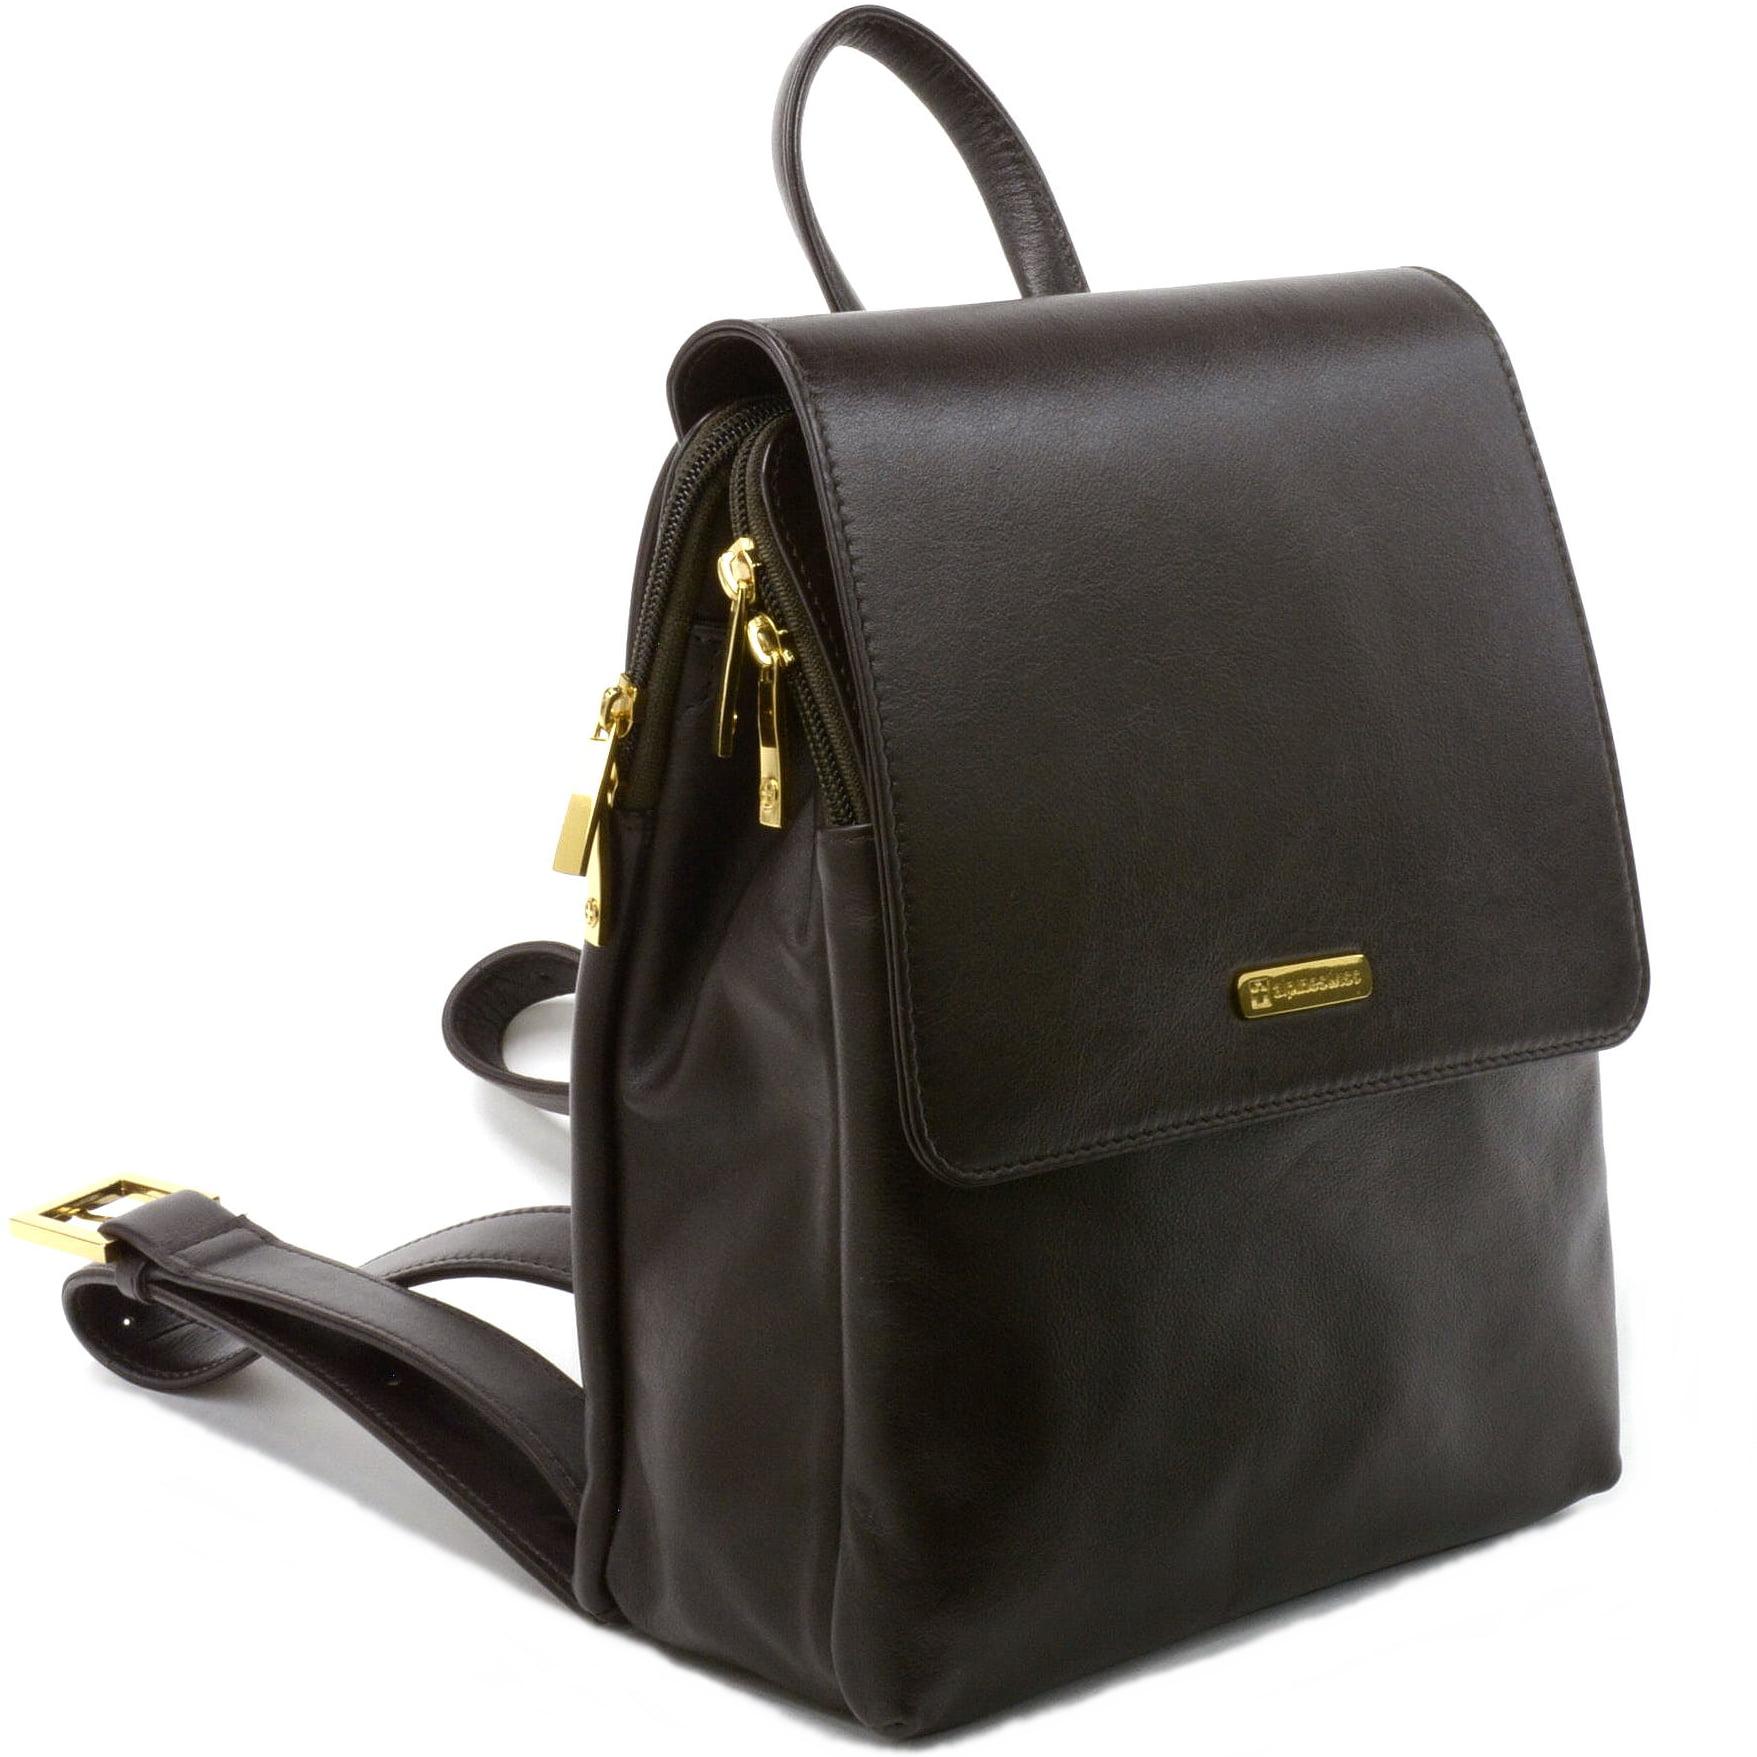 Swiss Womens Genuine Leather Backpack Purse Everyday Handbags